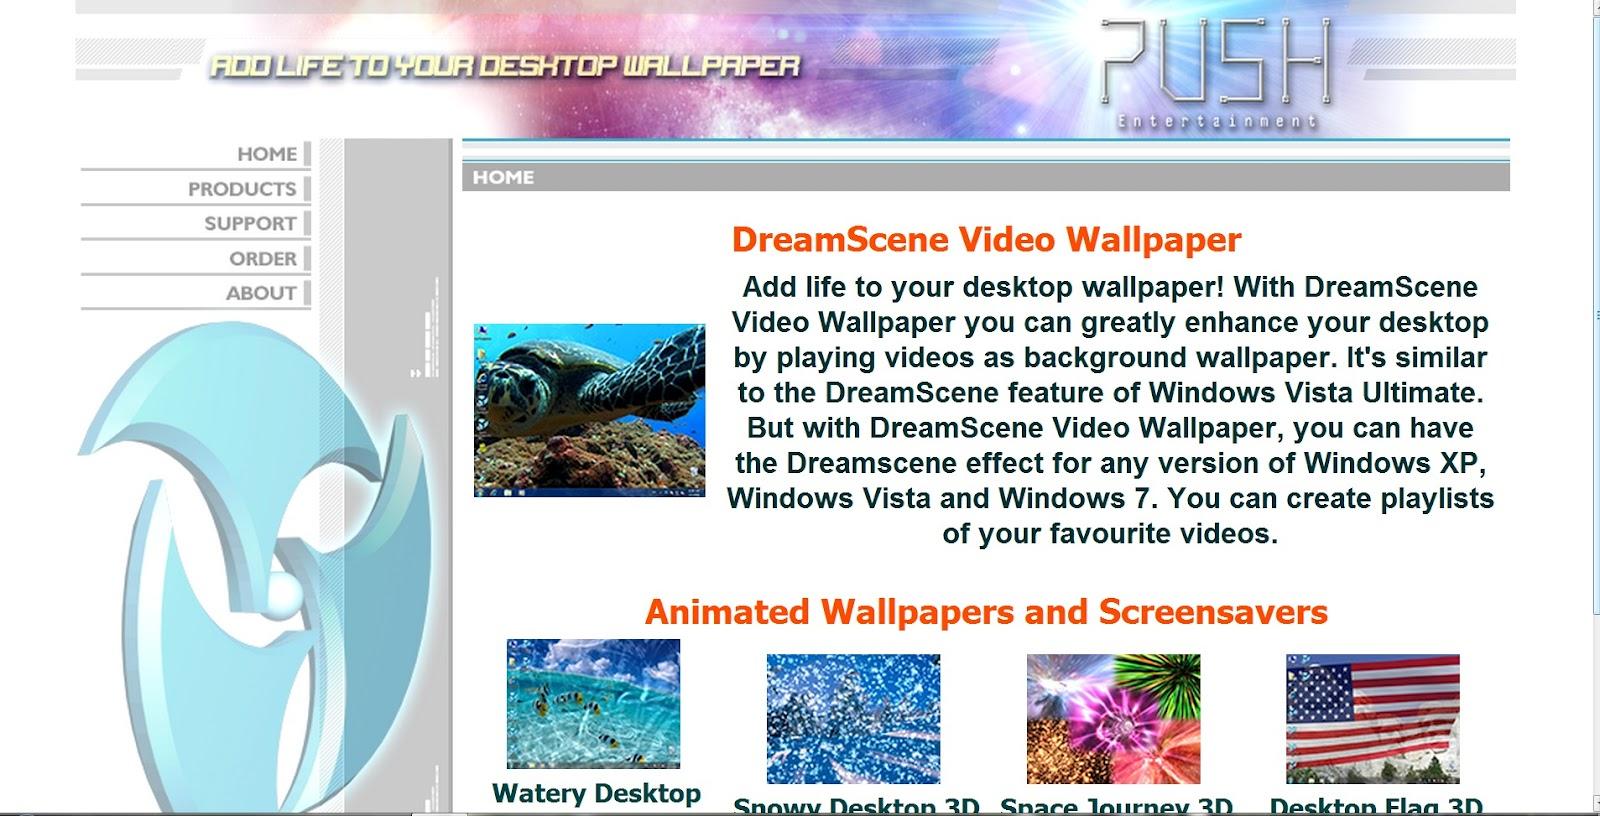 50 Push Entertainment Dreamscene Video Wallpaper On